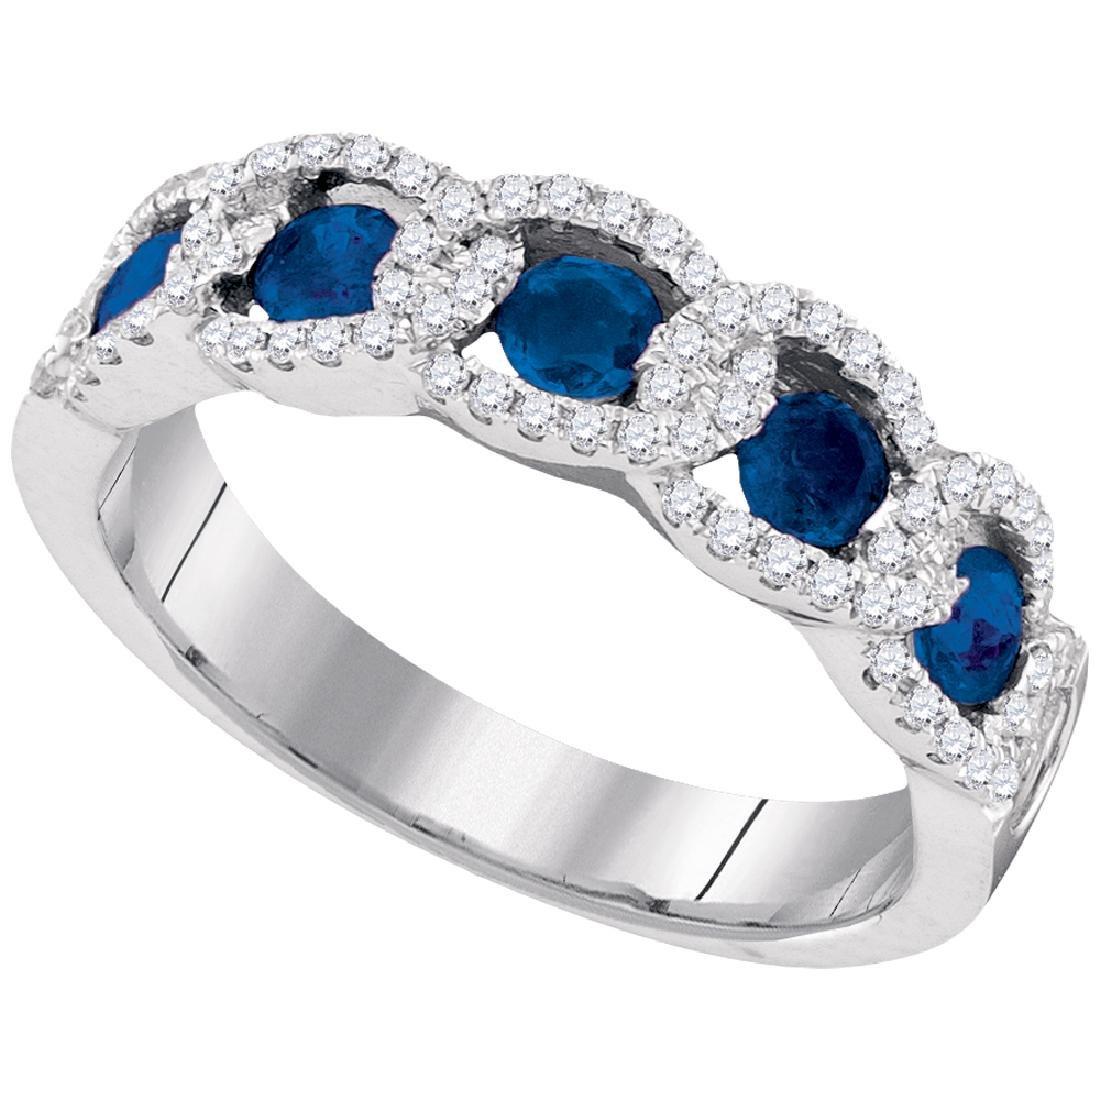 1.01 CTW Diamond Ring 14KT White Gold - REF-89M9H